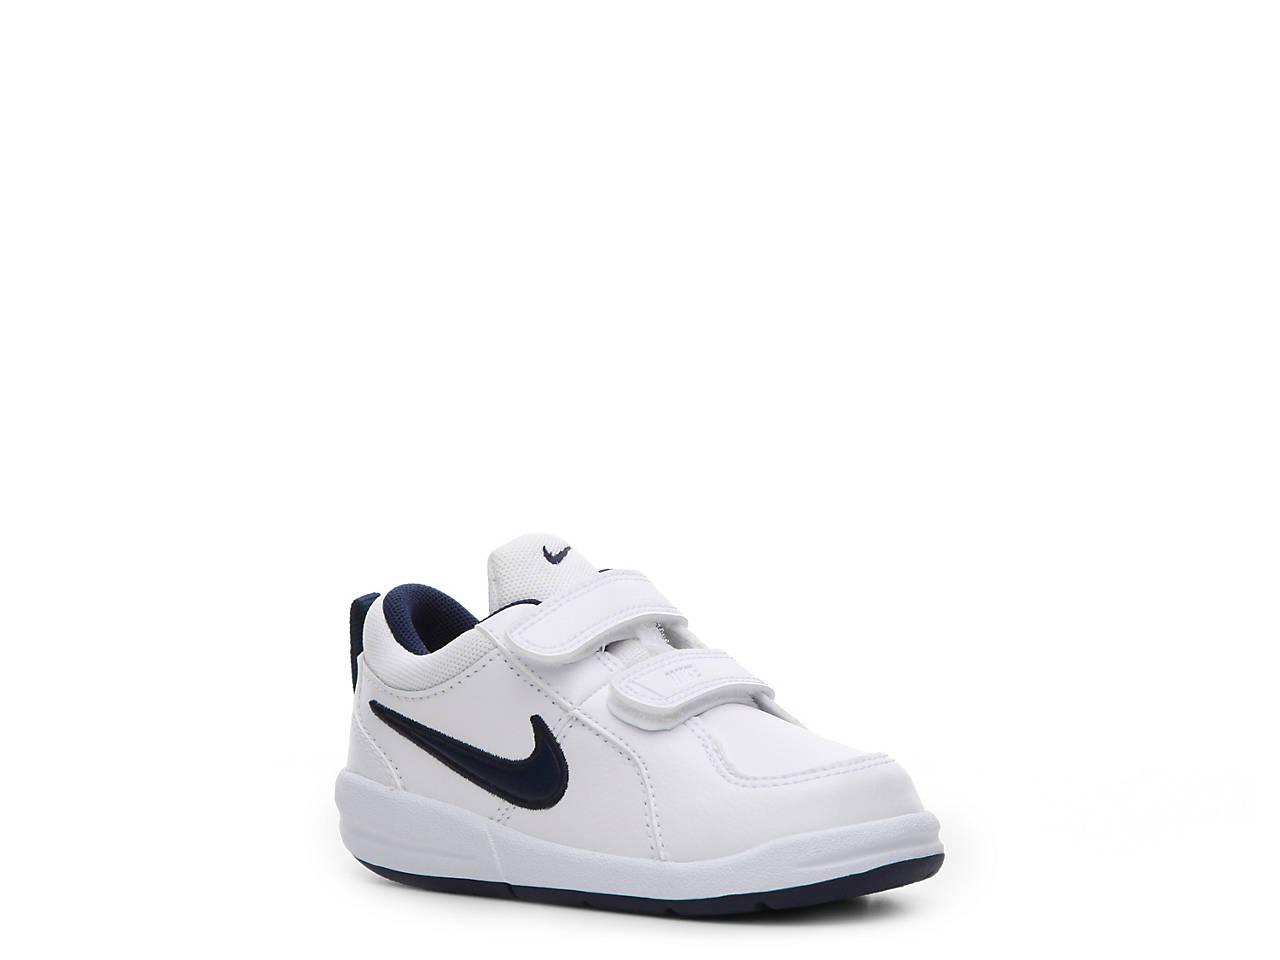 2d2411034 Nike Pico 4 Infant   Toddler Sneaker Kids Shoes